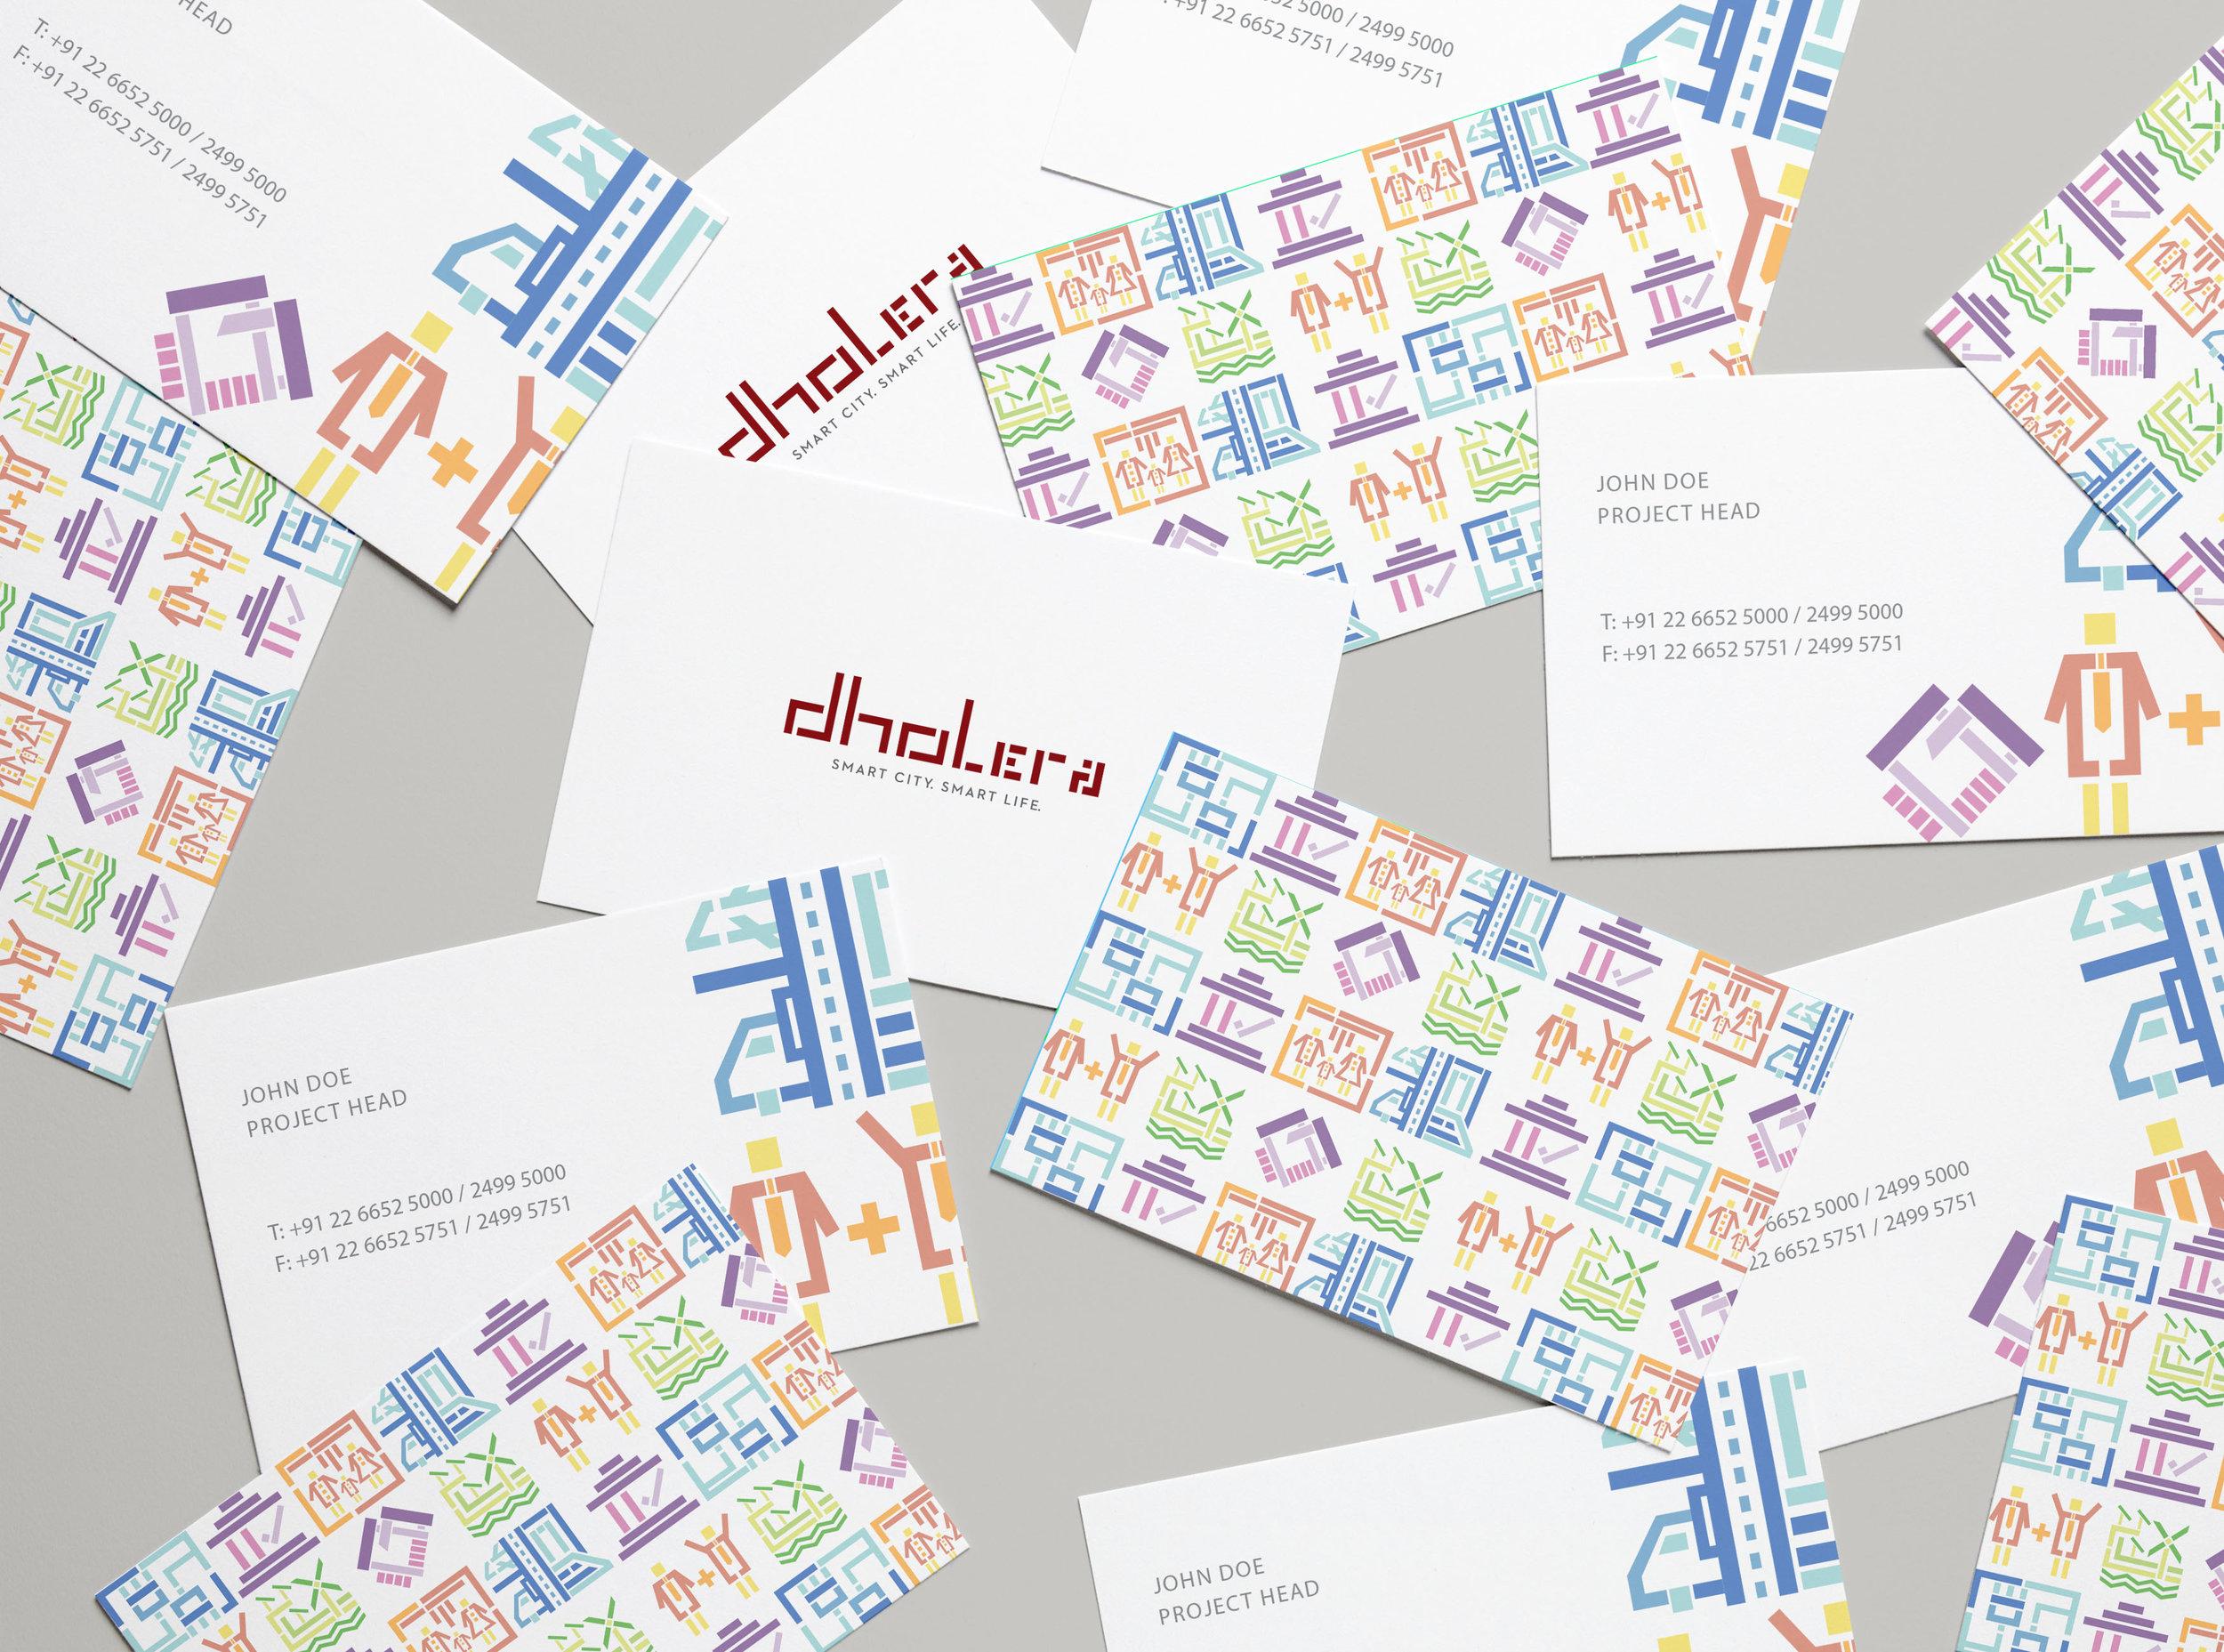 Dholera Smart City Branding